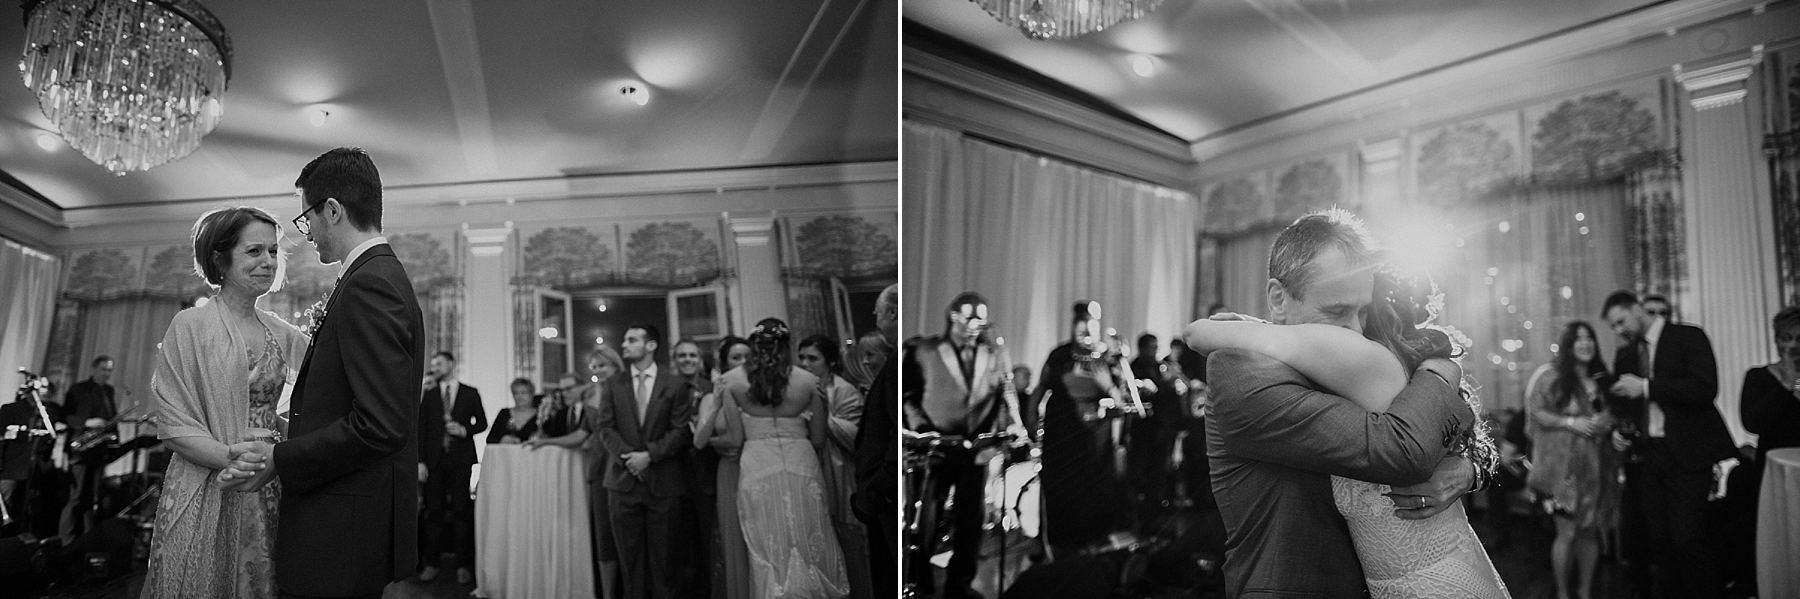 genesse-valley-club-wedding_0008.jpg